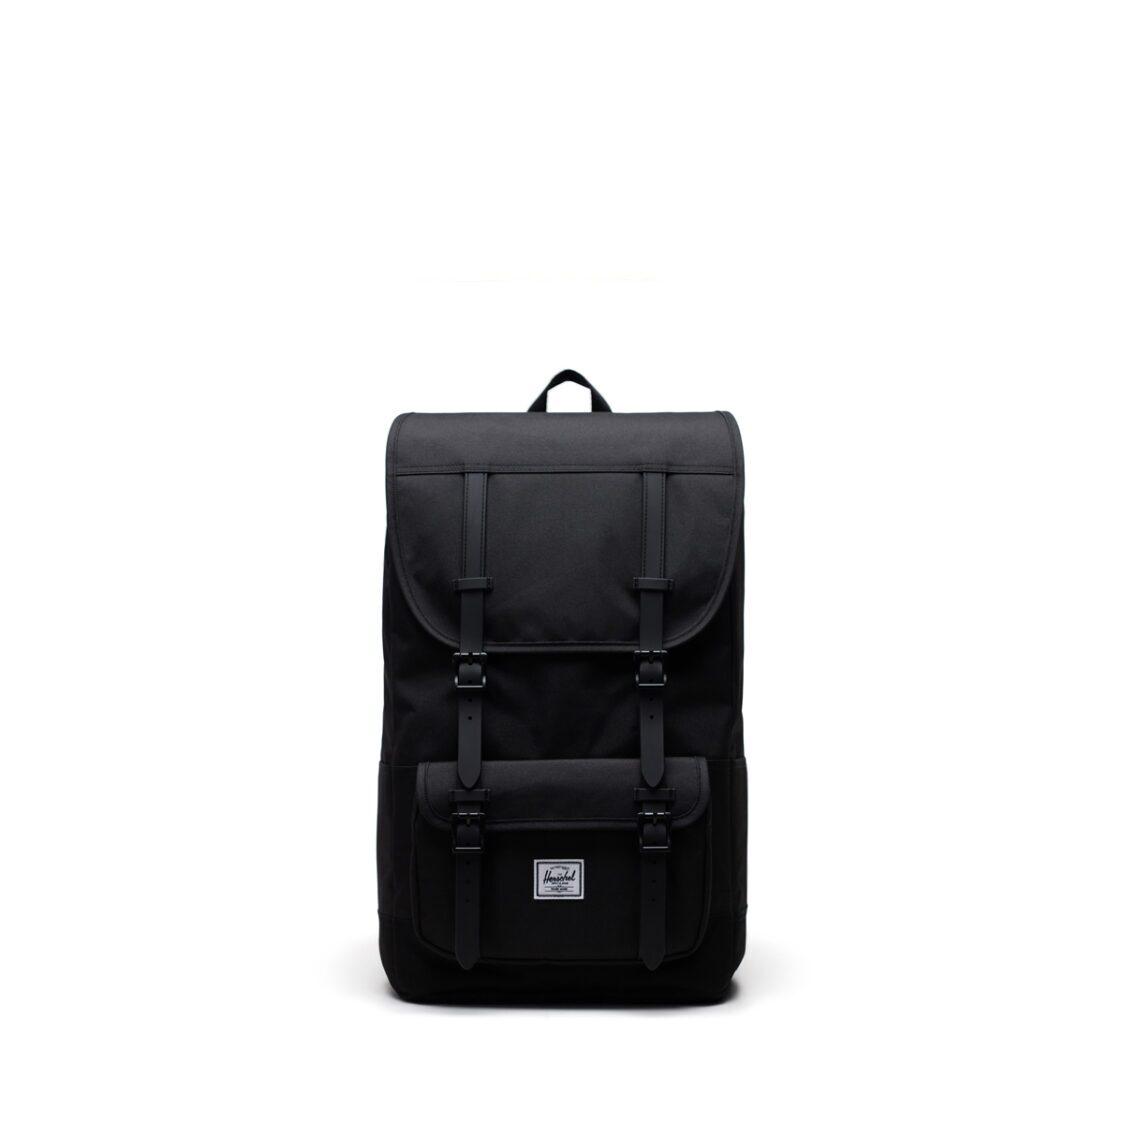 Herschel Little America Pro Black Backpack 11038-00001-OS